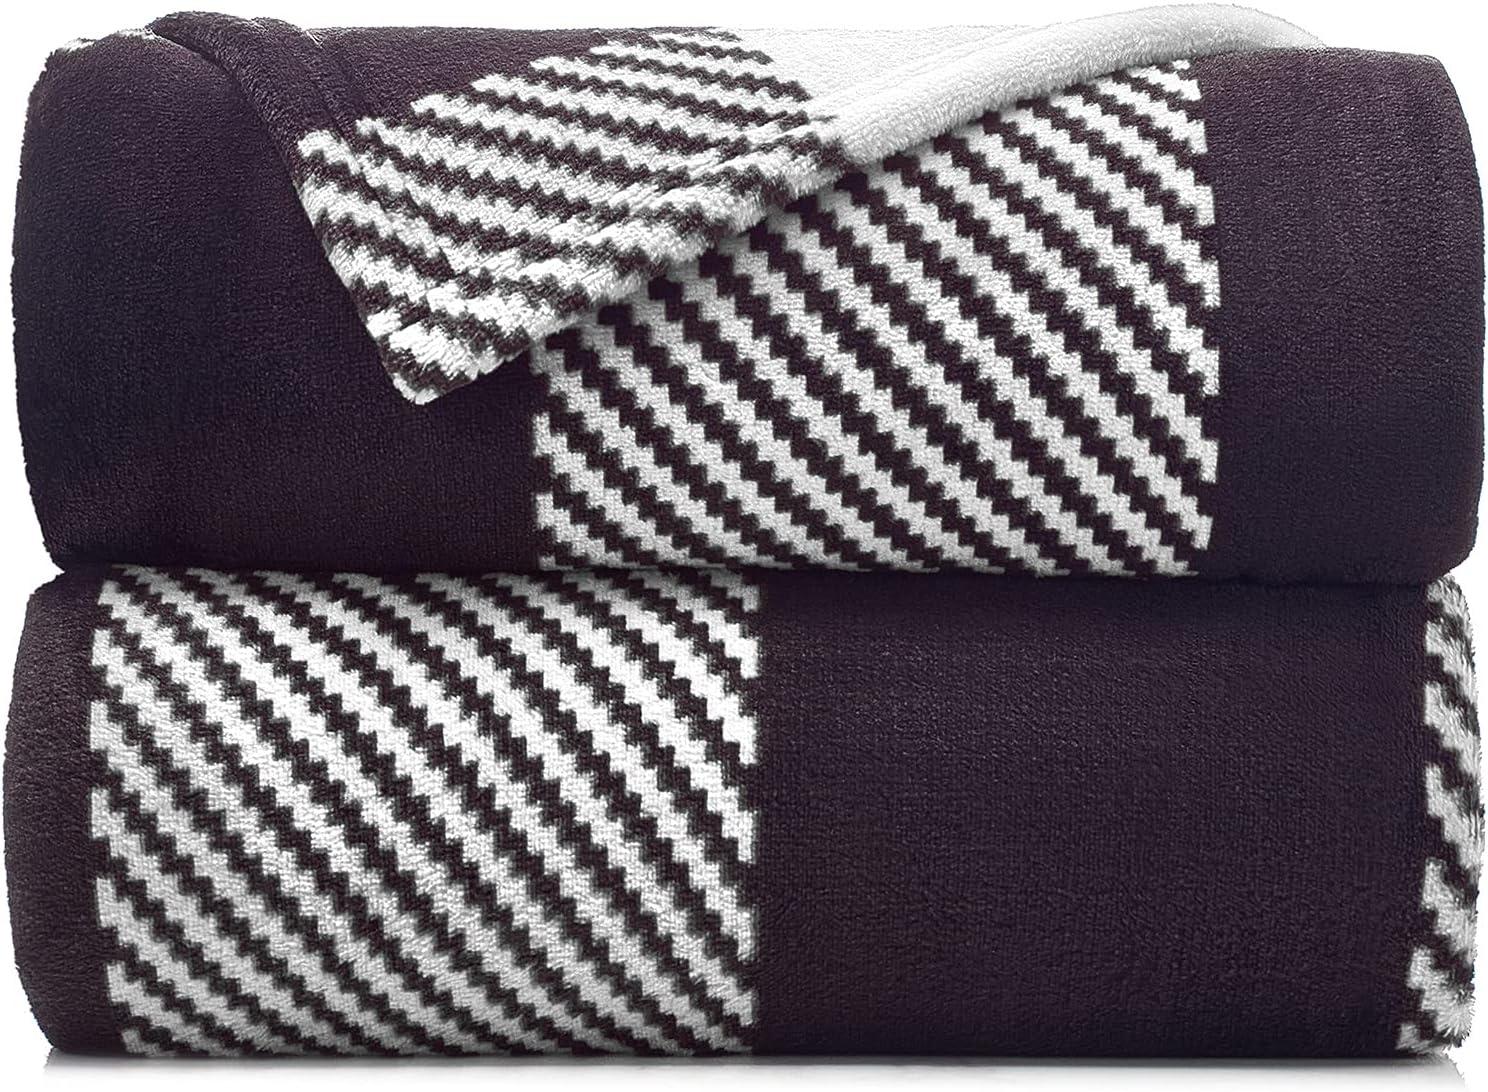 Malinad Plaid Sacramento Mall Blanket King Size - Black Direct stock discount 108x90 Printed White